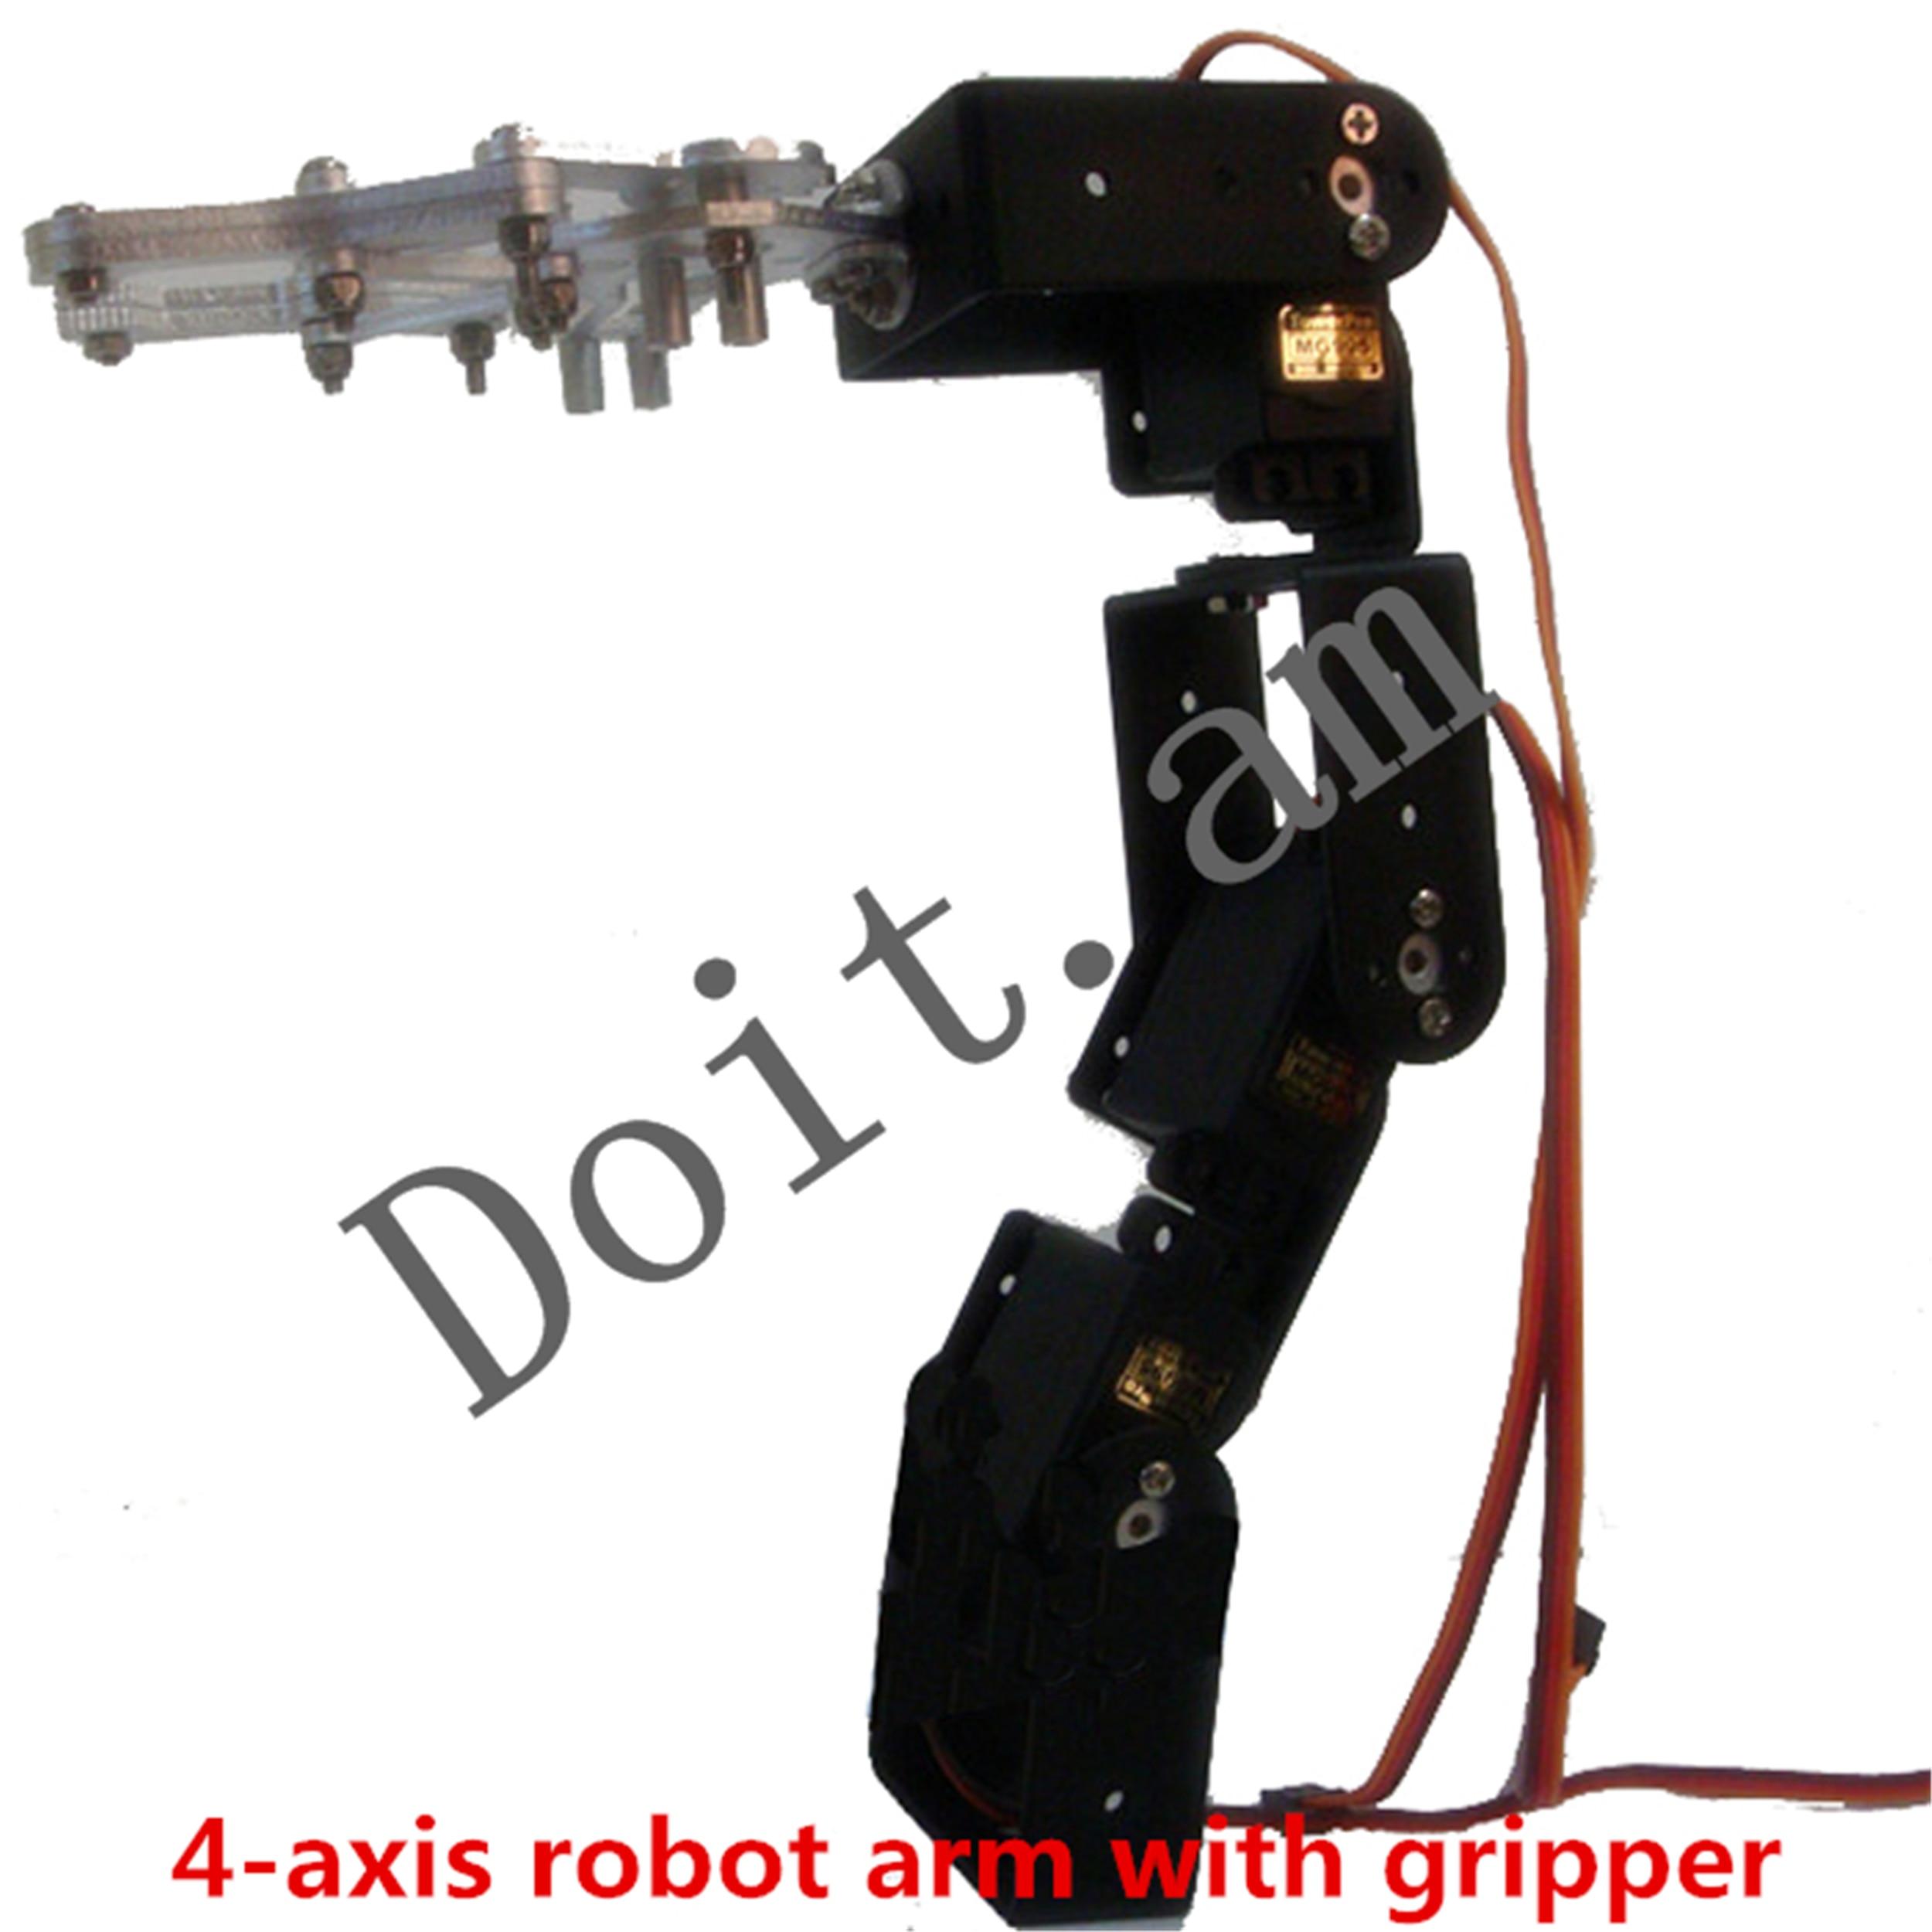 SNAM3900 DIY 4-DOF Aluminum Alloy Robot Arm with 4 Steering Gears Arduino Board